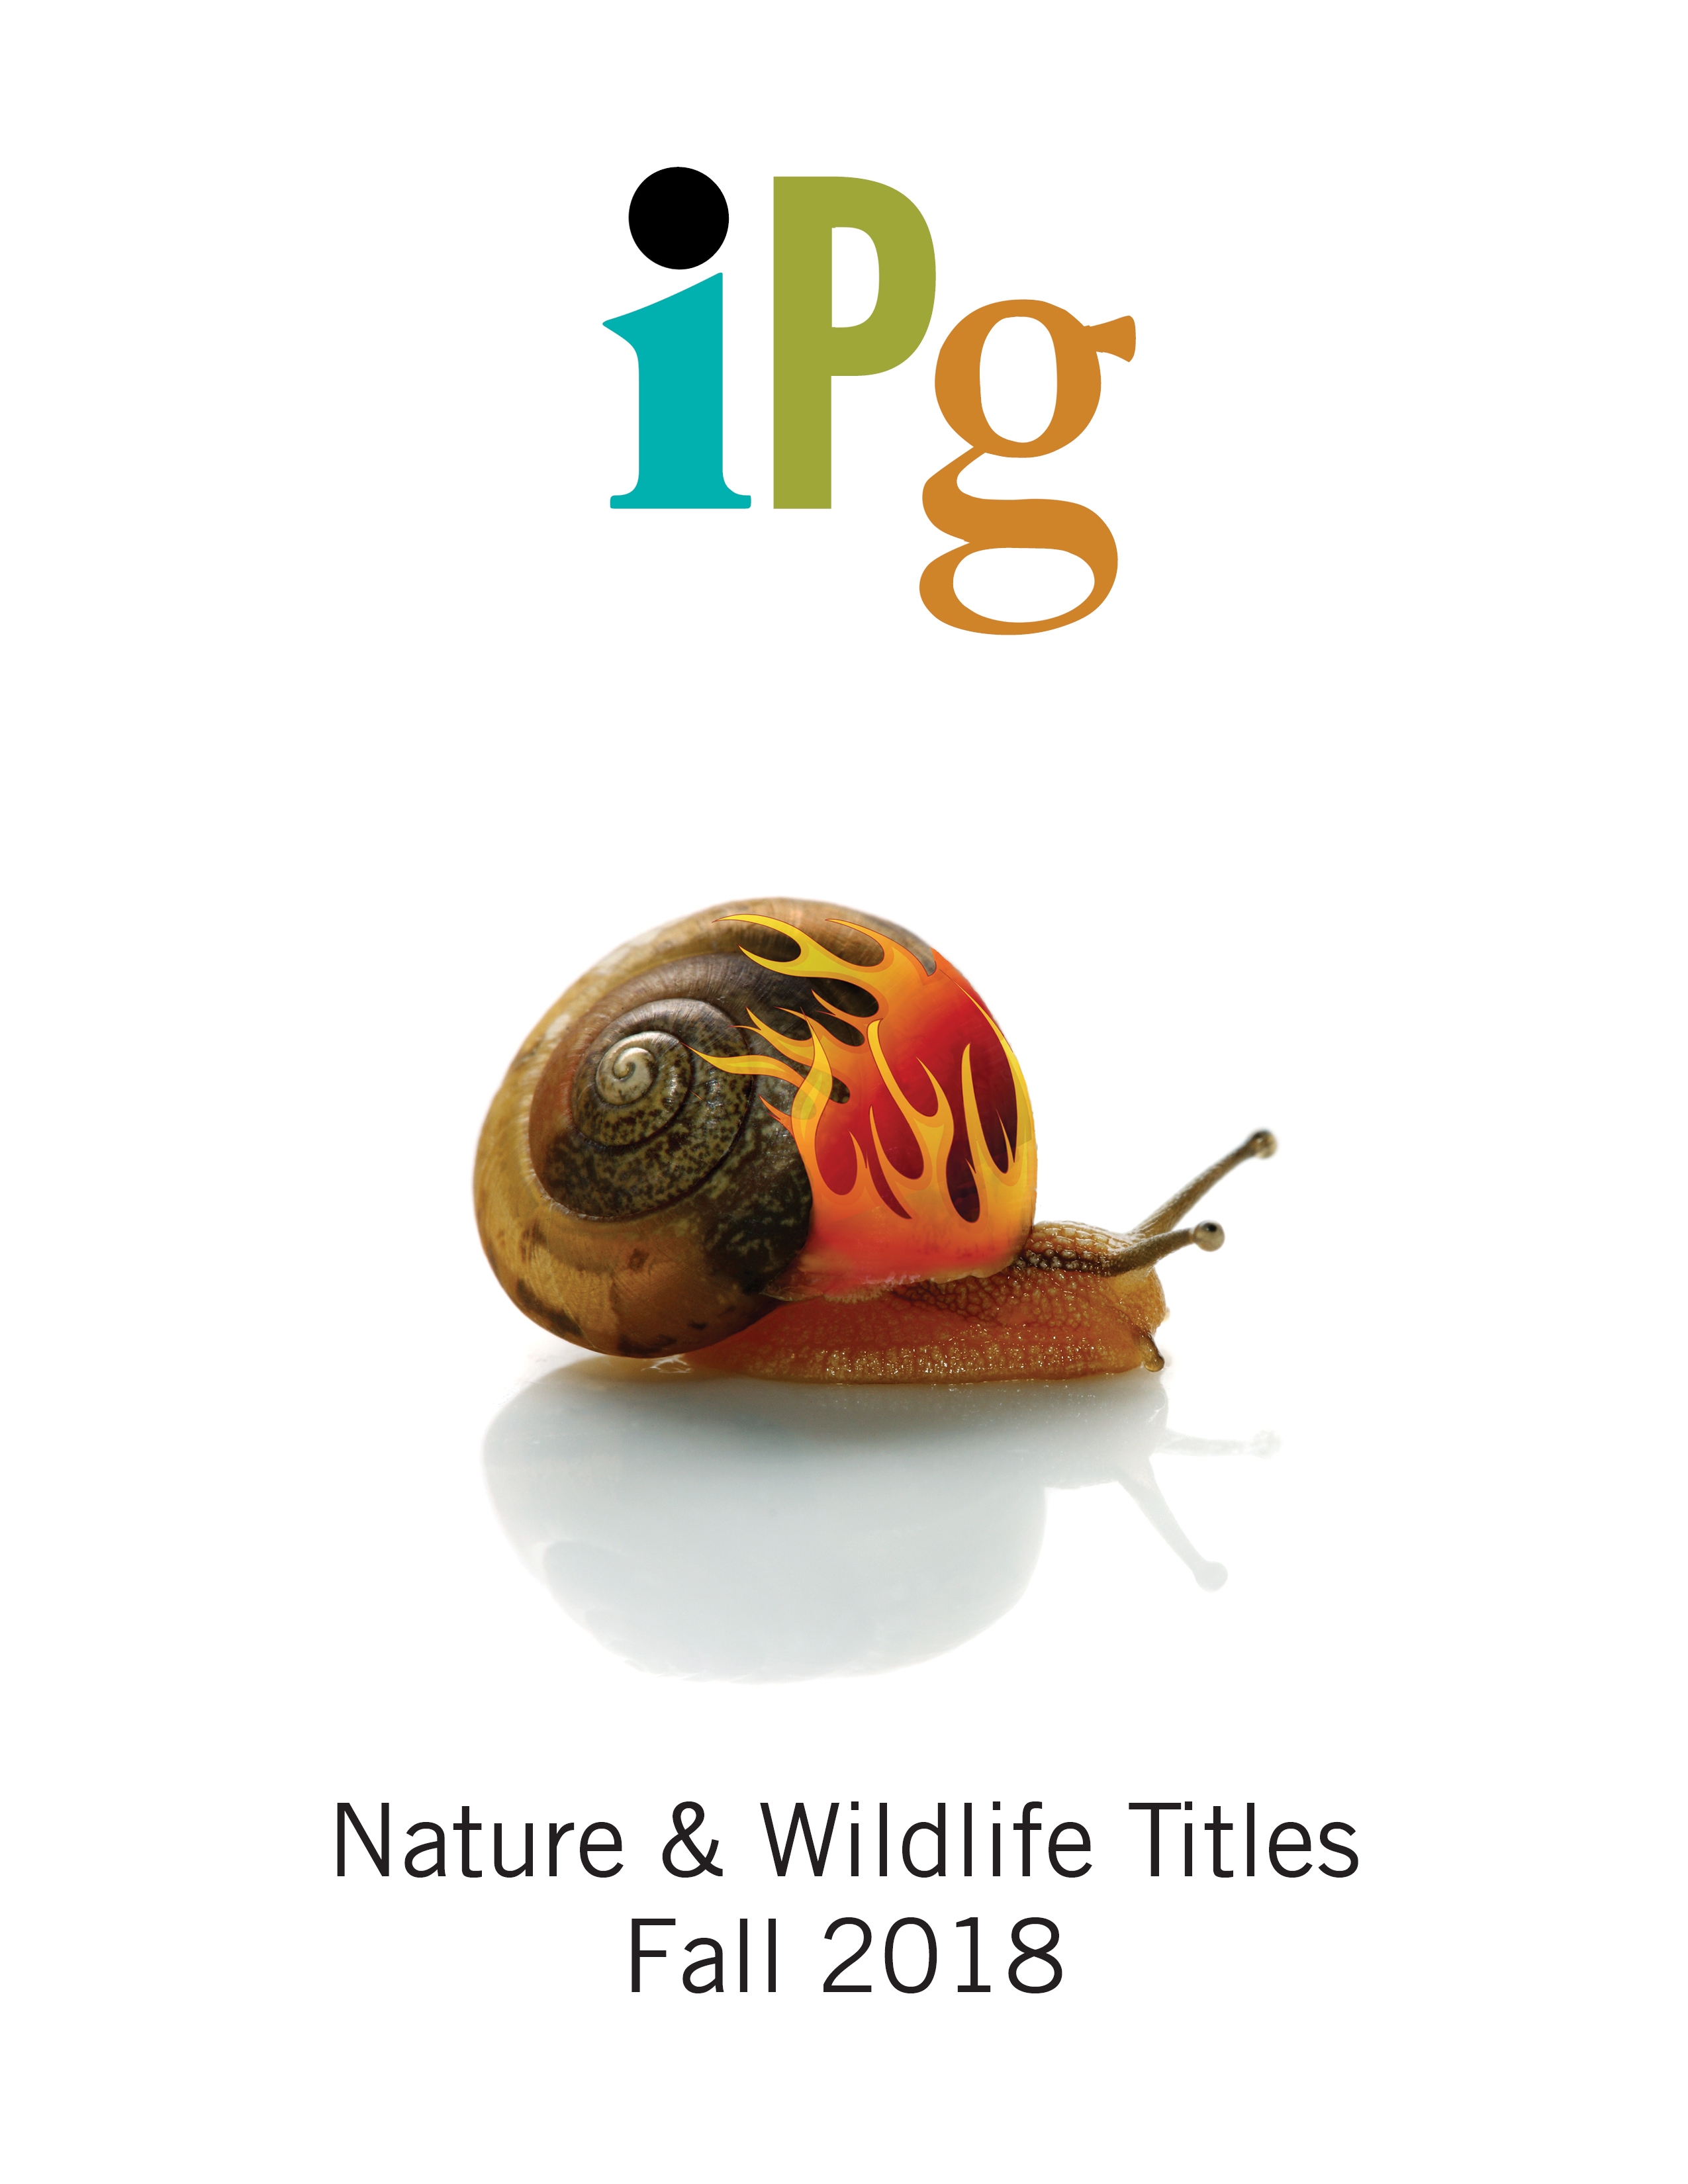 Nature & Wildlife TItles